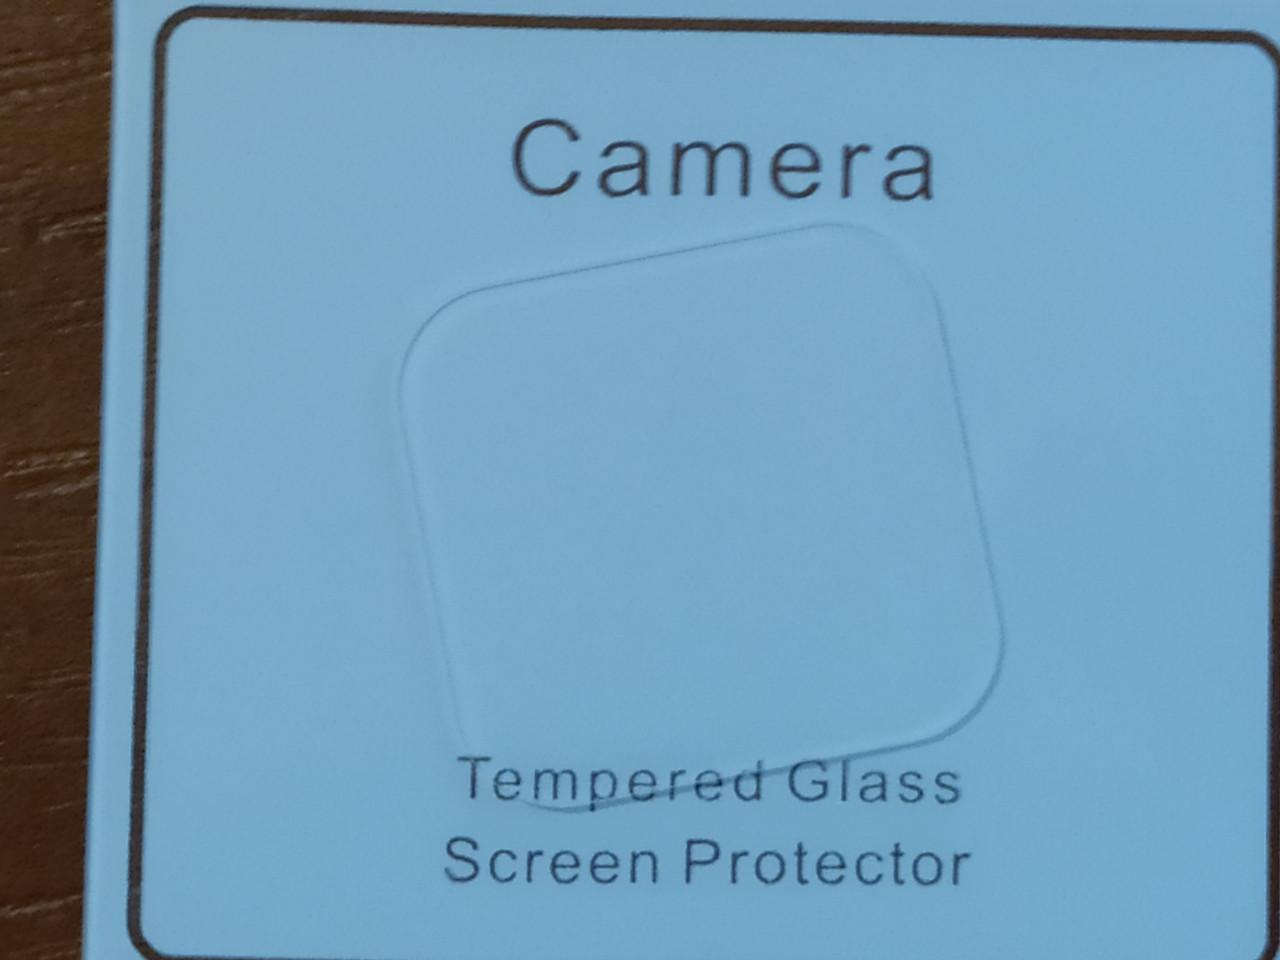 Захисне скло на камеру Tempered Glass Screen Protector Xiaomi Redmi Note 9 Pro / Note 9s